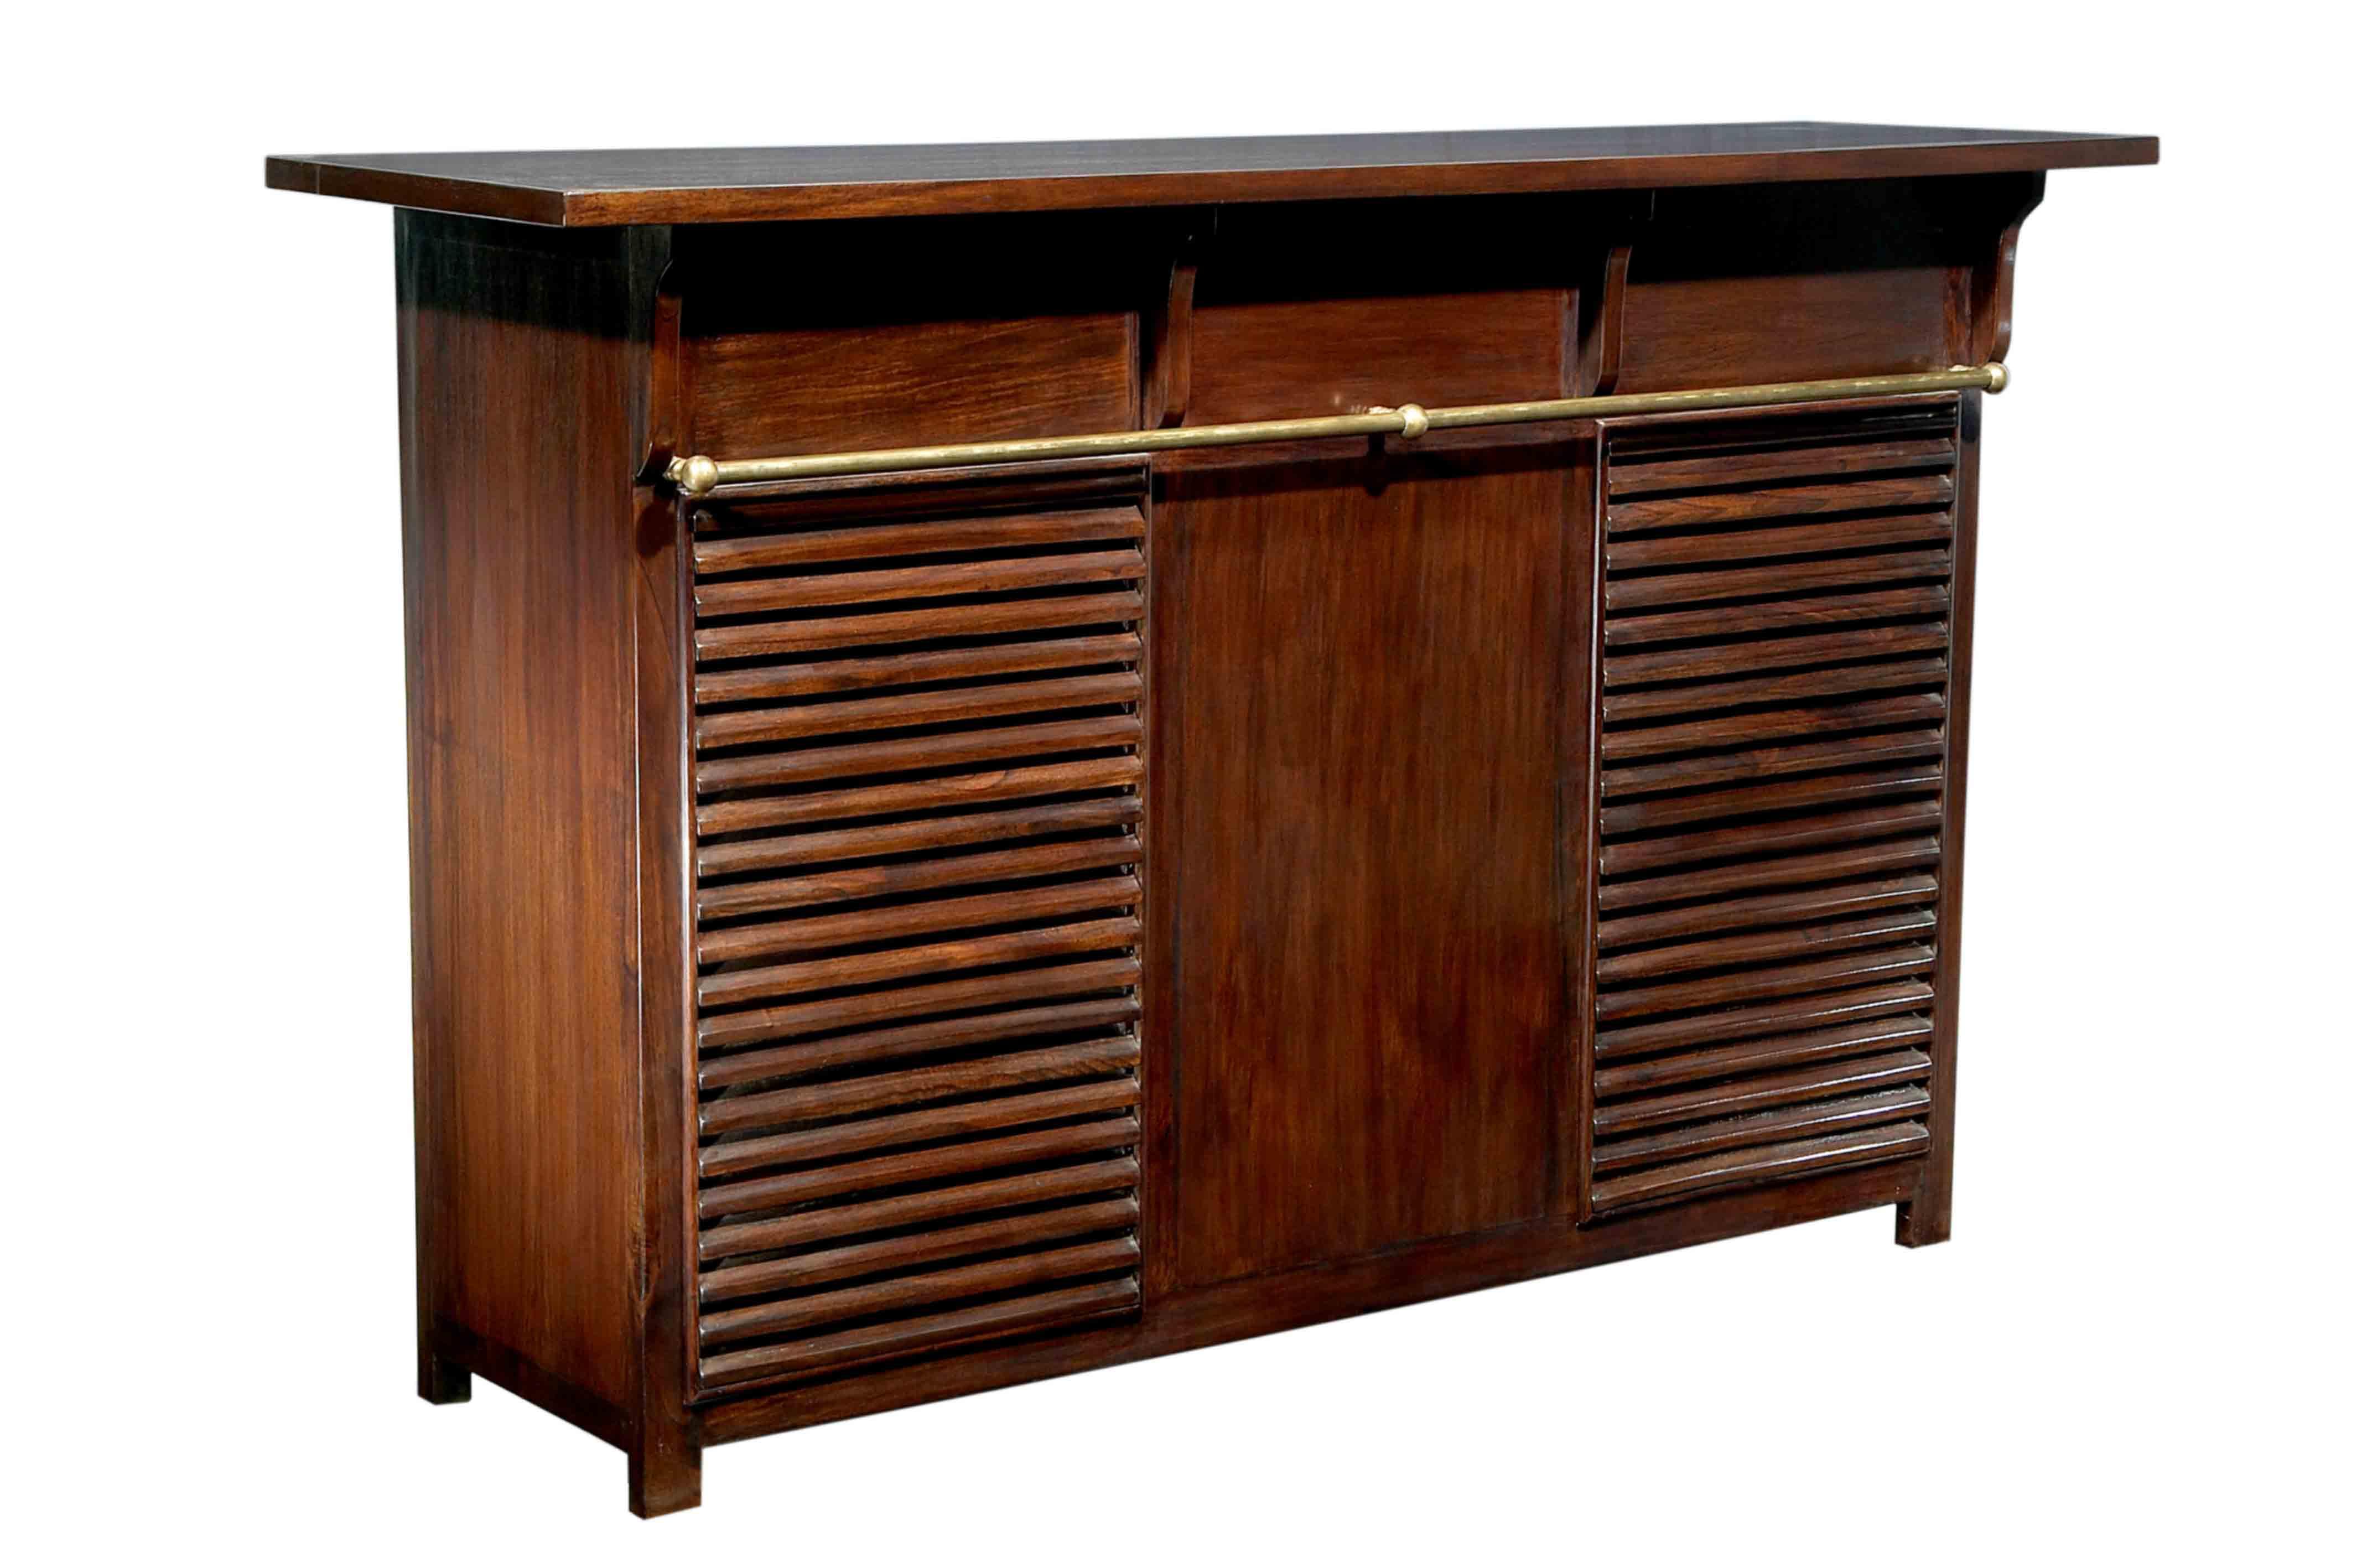 materiels de bar les fournisseurs grossistes et. Black Bedroom Furniture Sets. Home Design Ideas